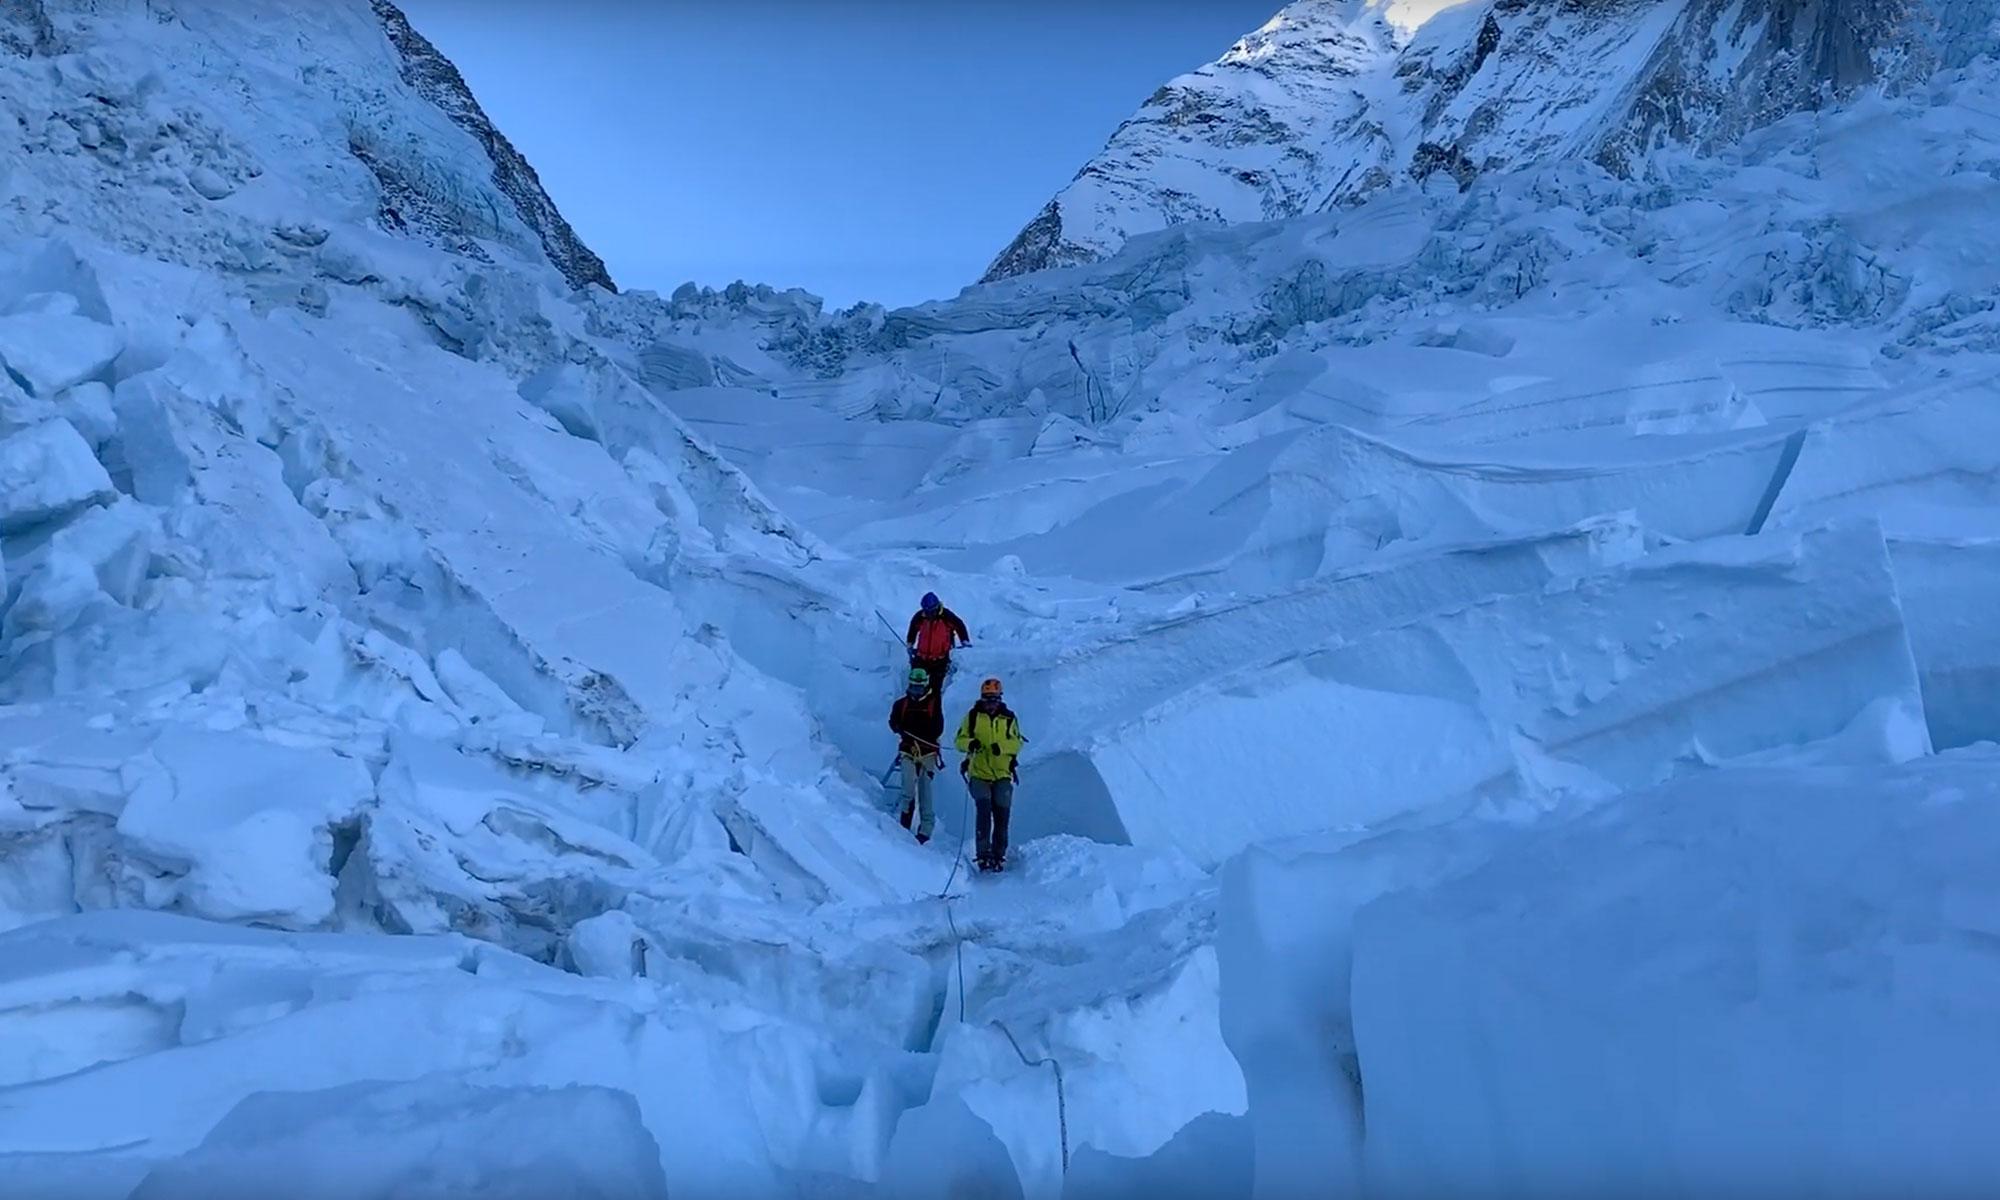 Cascade de glace du Khumbu